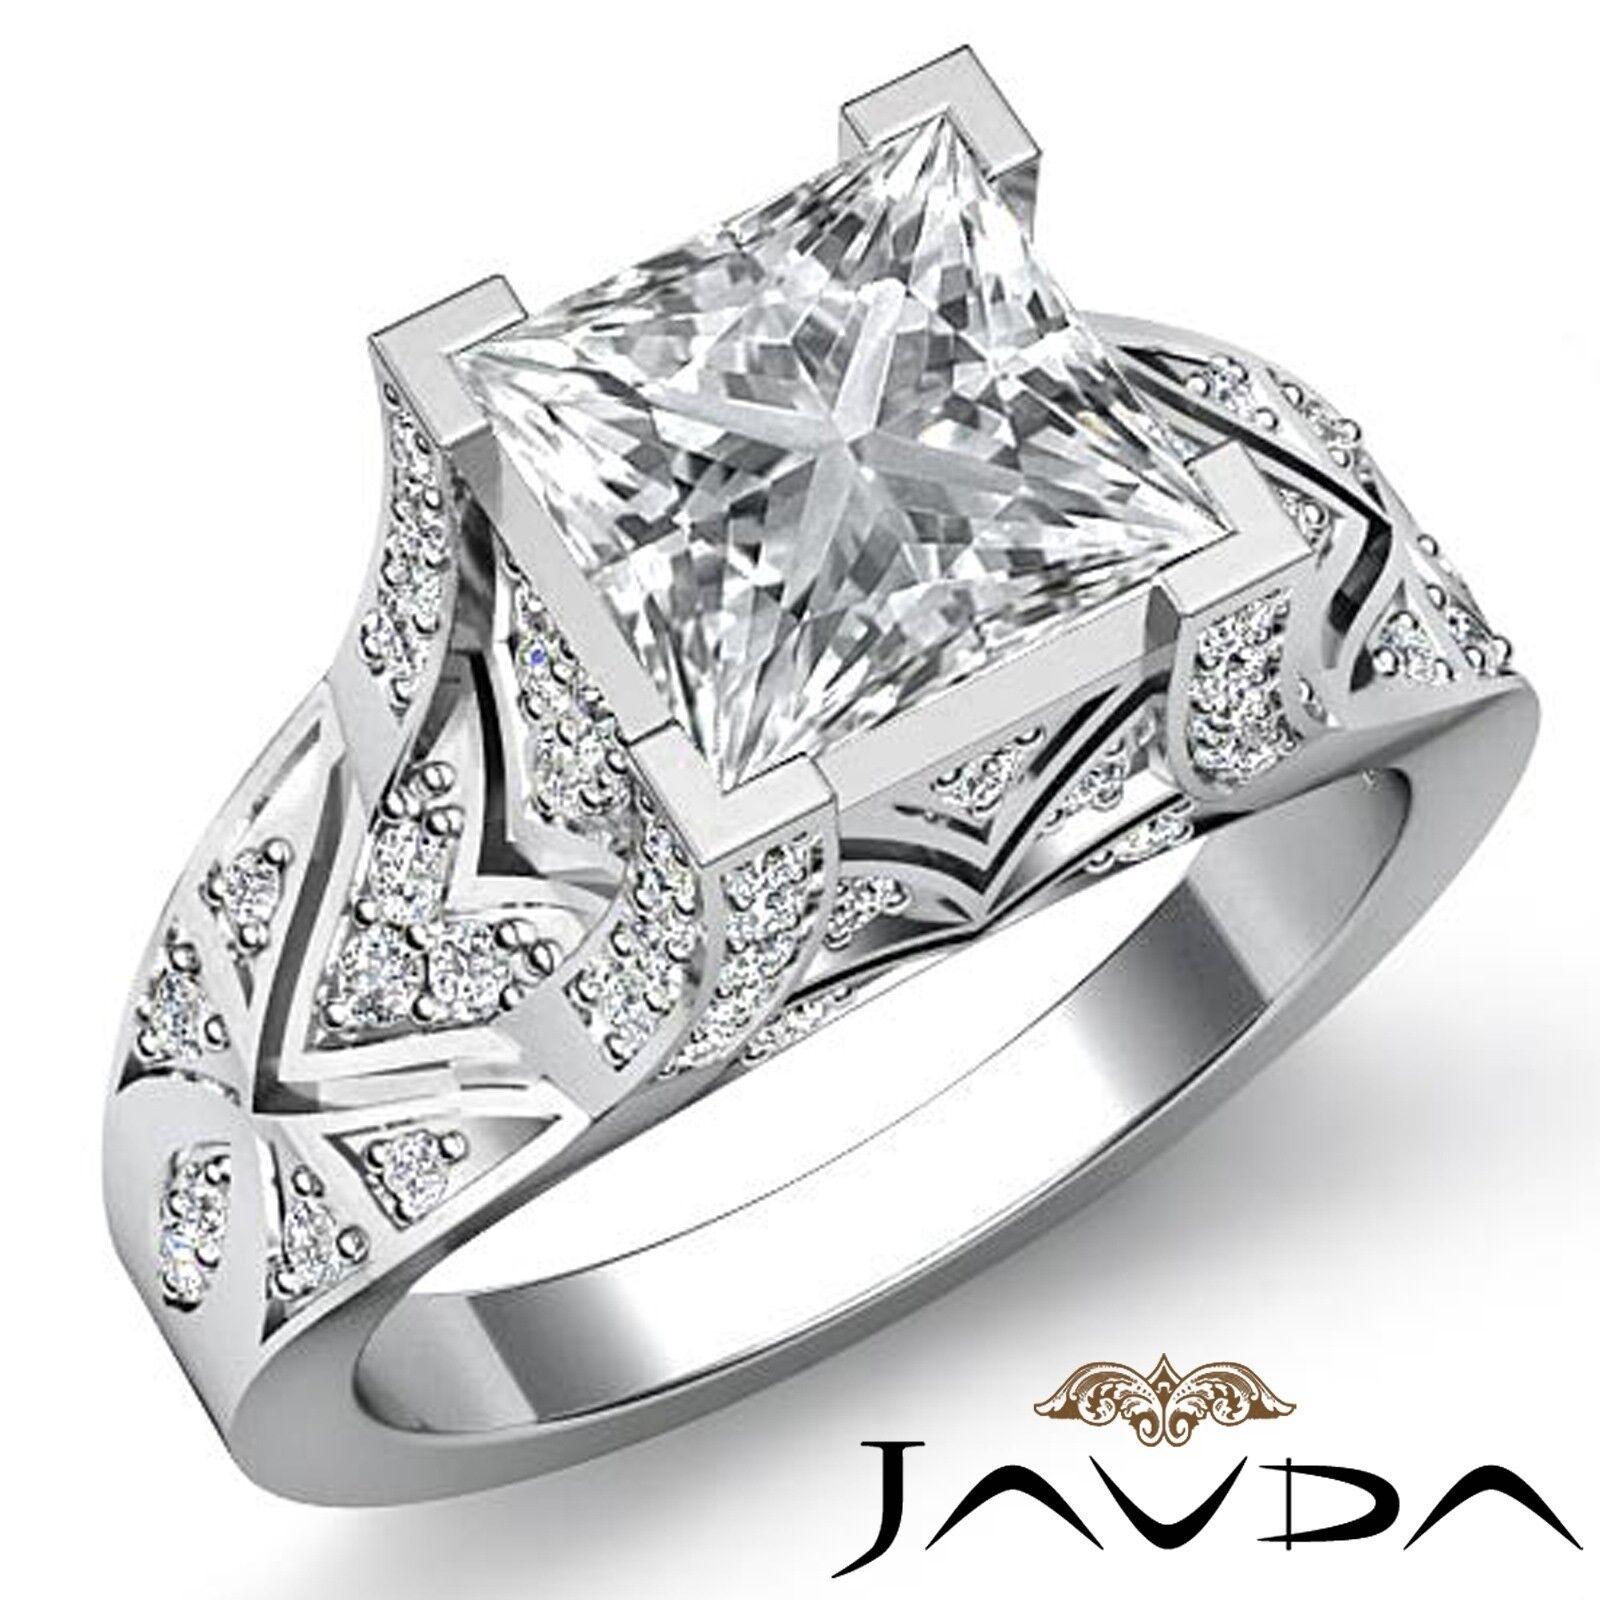 1.5ctw Antique Pave Princess Diamond  Engagement Ring GIA F-VS1 White Gold